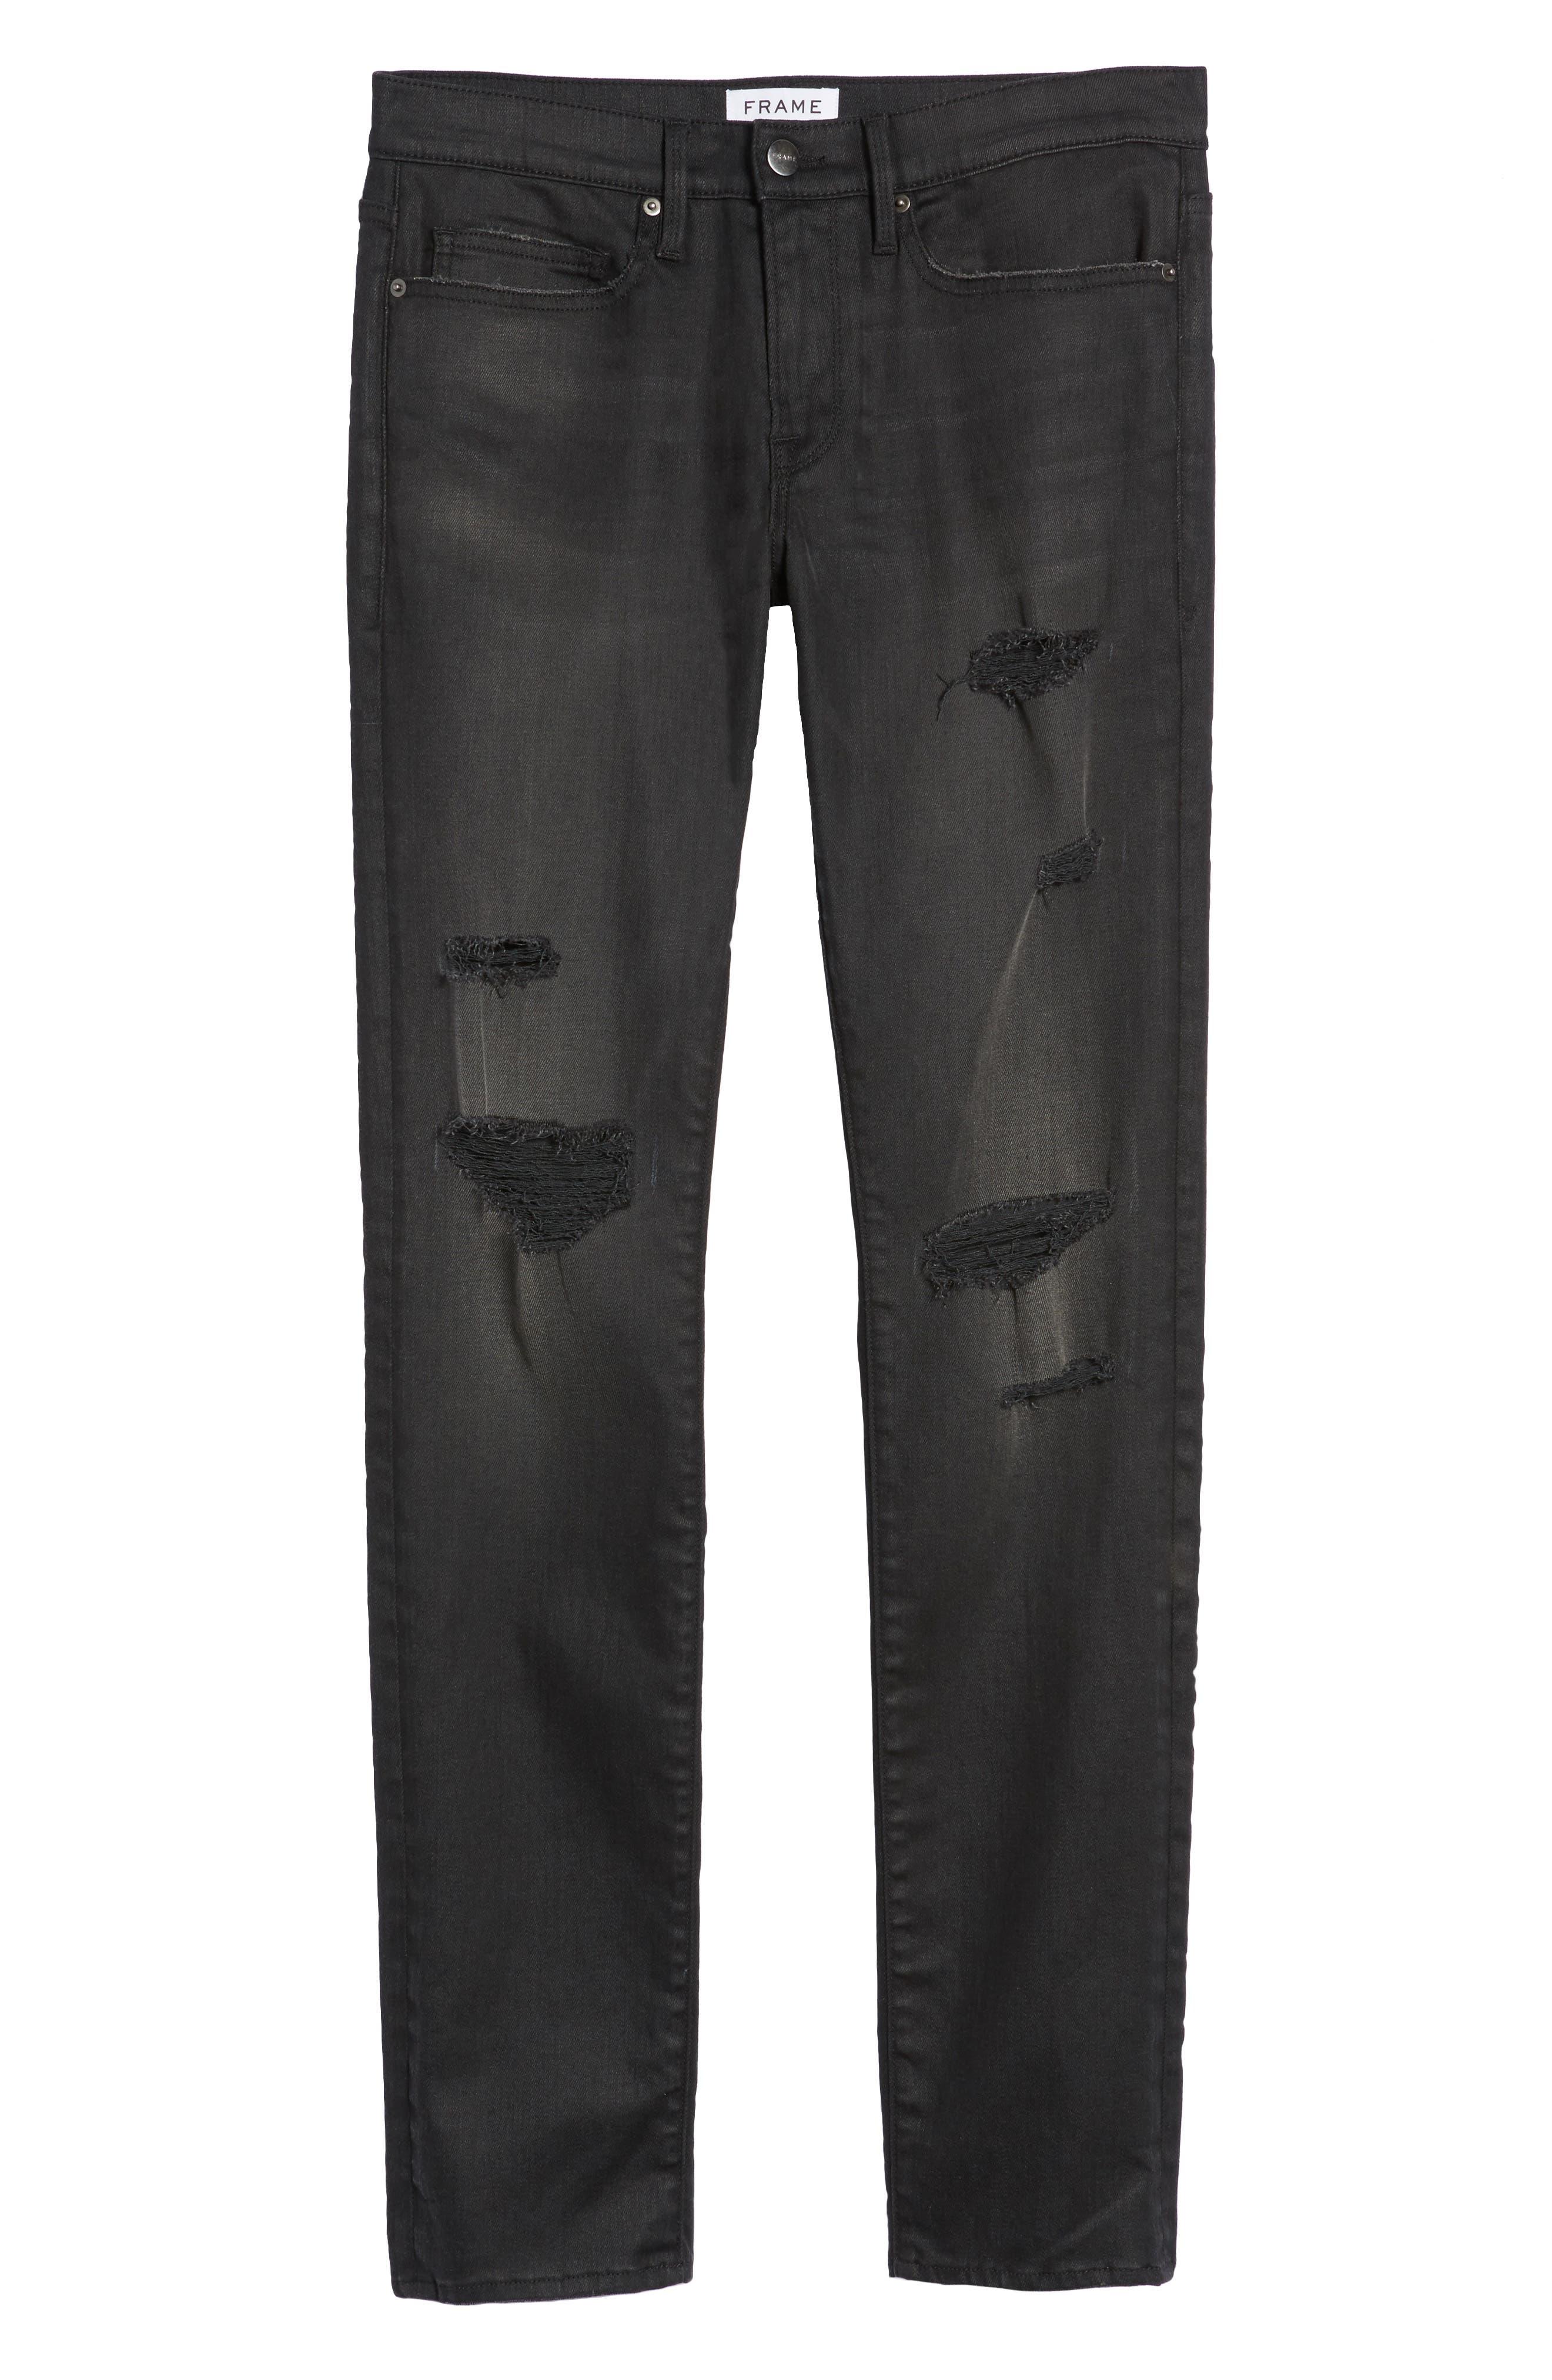 L'Homme Slim Fit Jeans,                             Alternate thumbnail 6, color,                             Flintwood